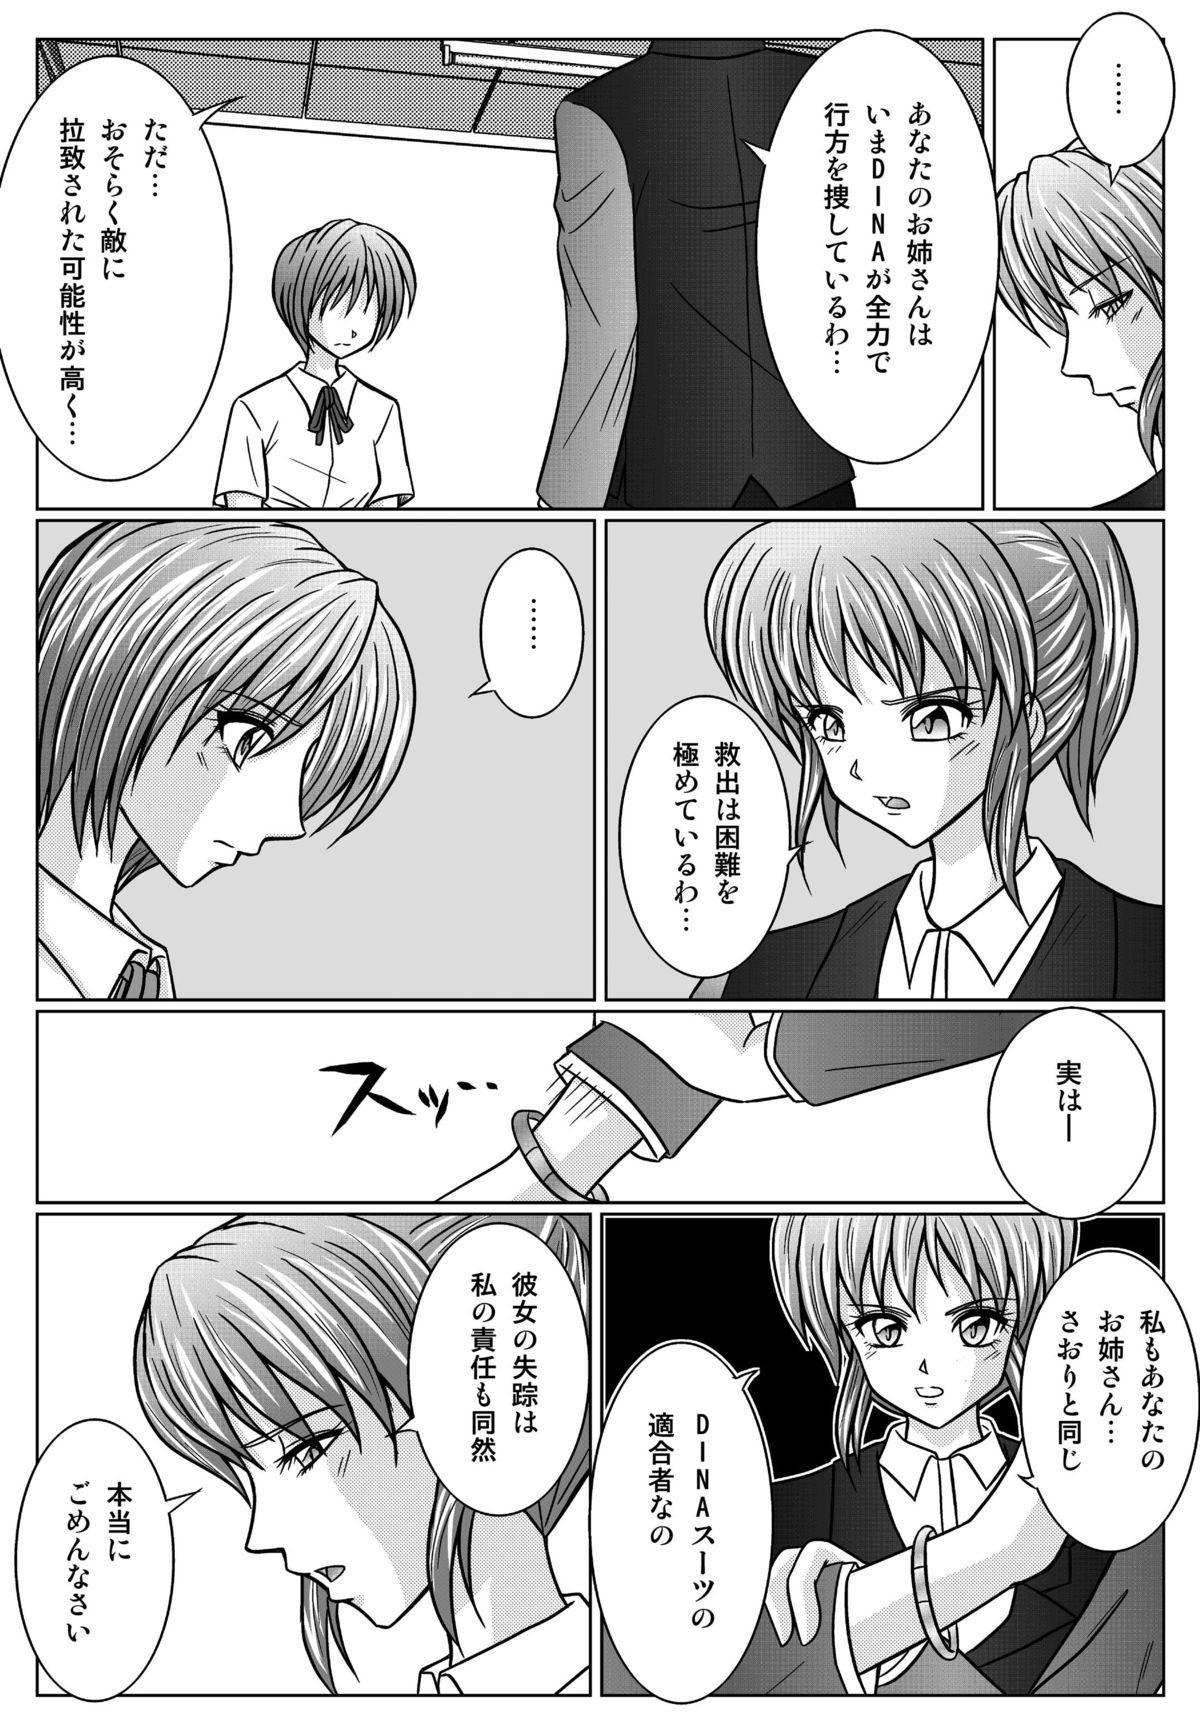 [Macxe's (monmon)] Tokubousentai Dinaranger ~Heroine Kairaku Sennou Keikaku~ Vol.01/02/03 (Renkaban) [Digital] 77